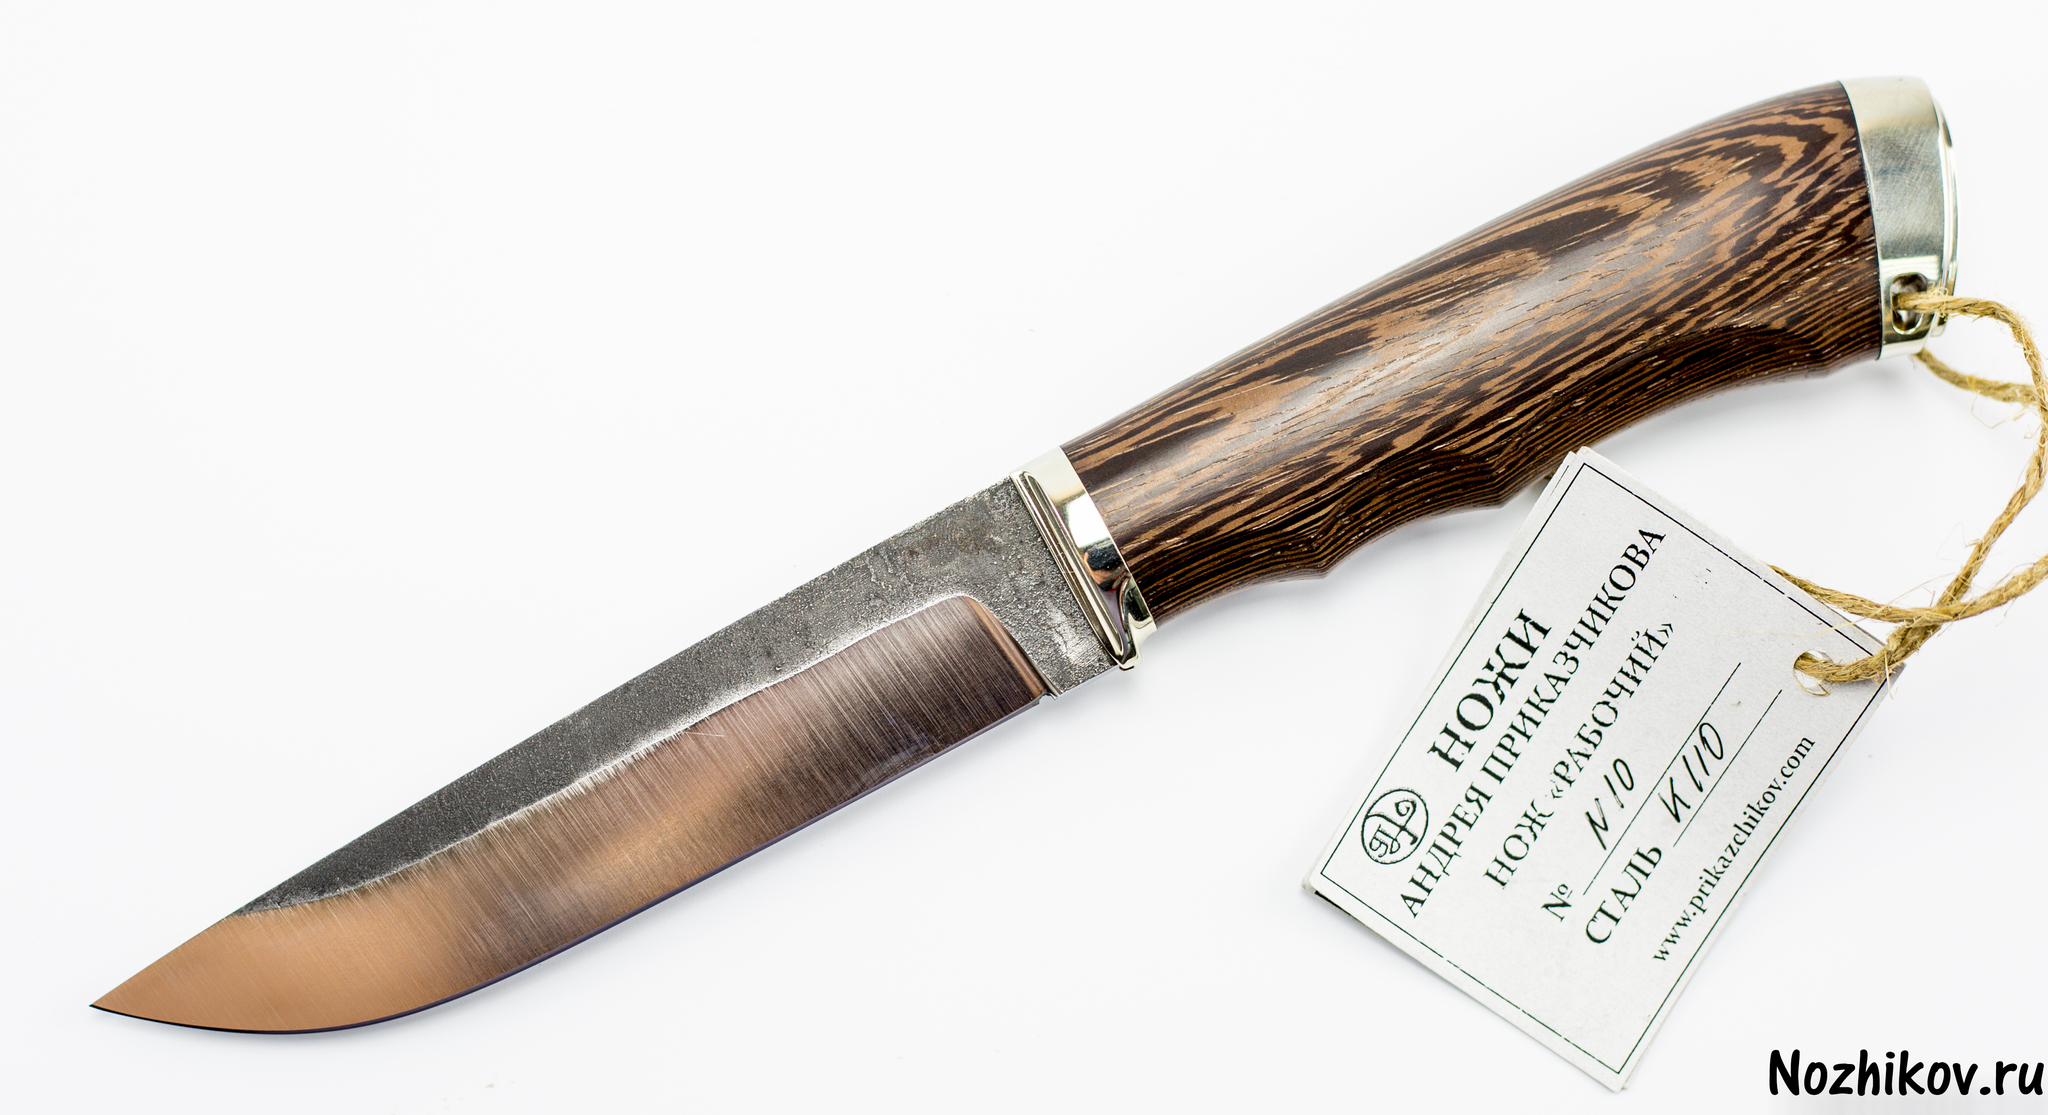 Нож Рабочий №10 из K110, от Приказчикова